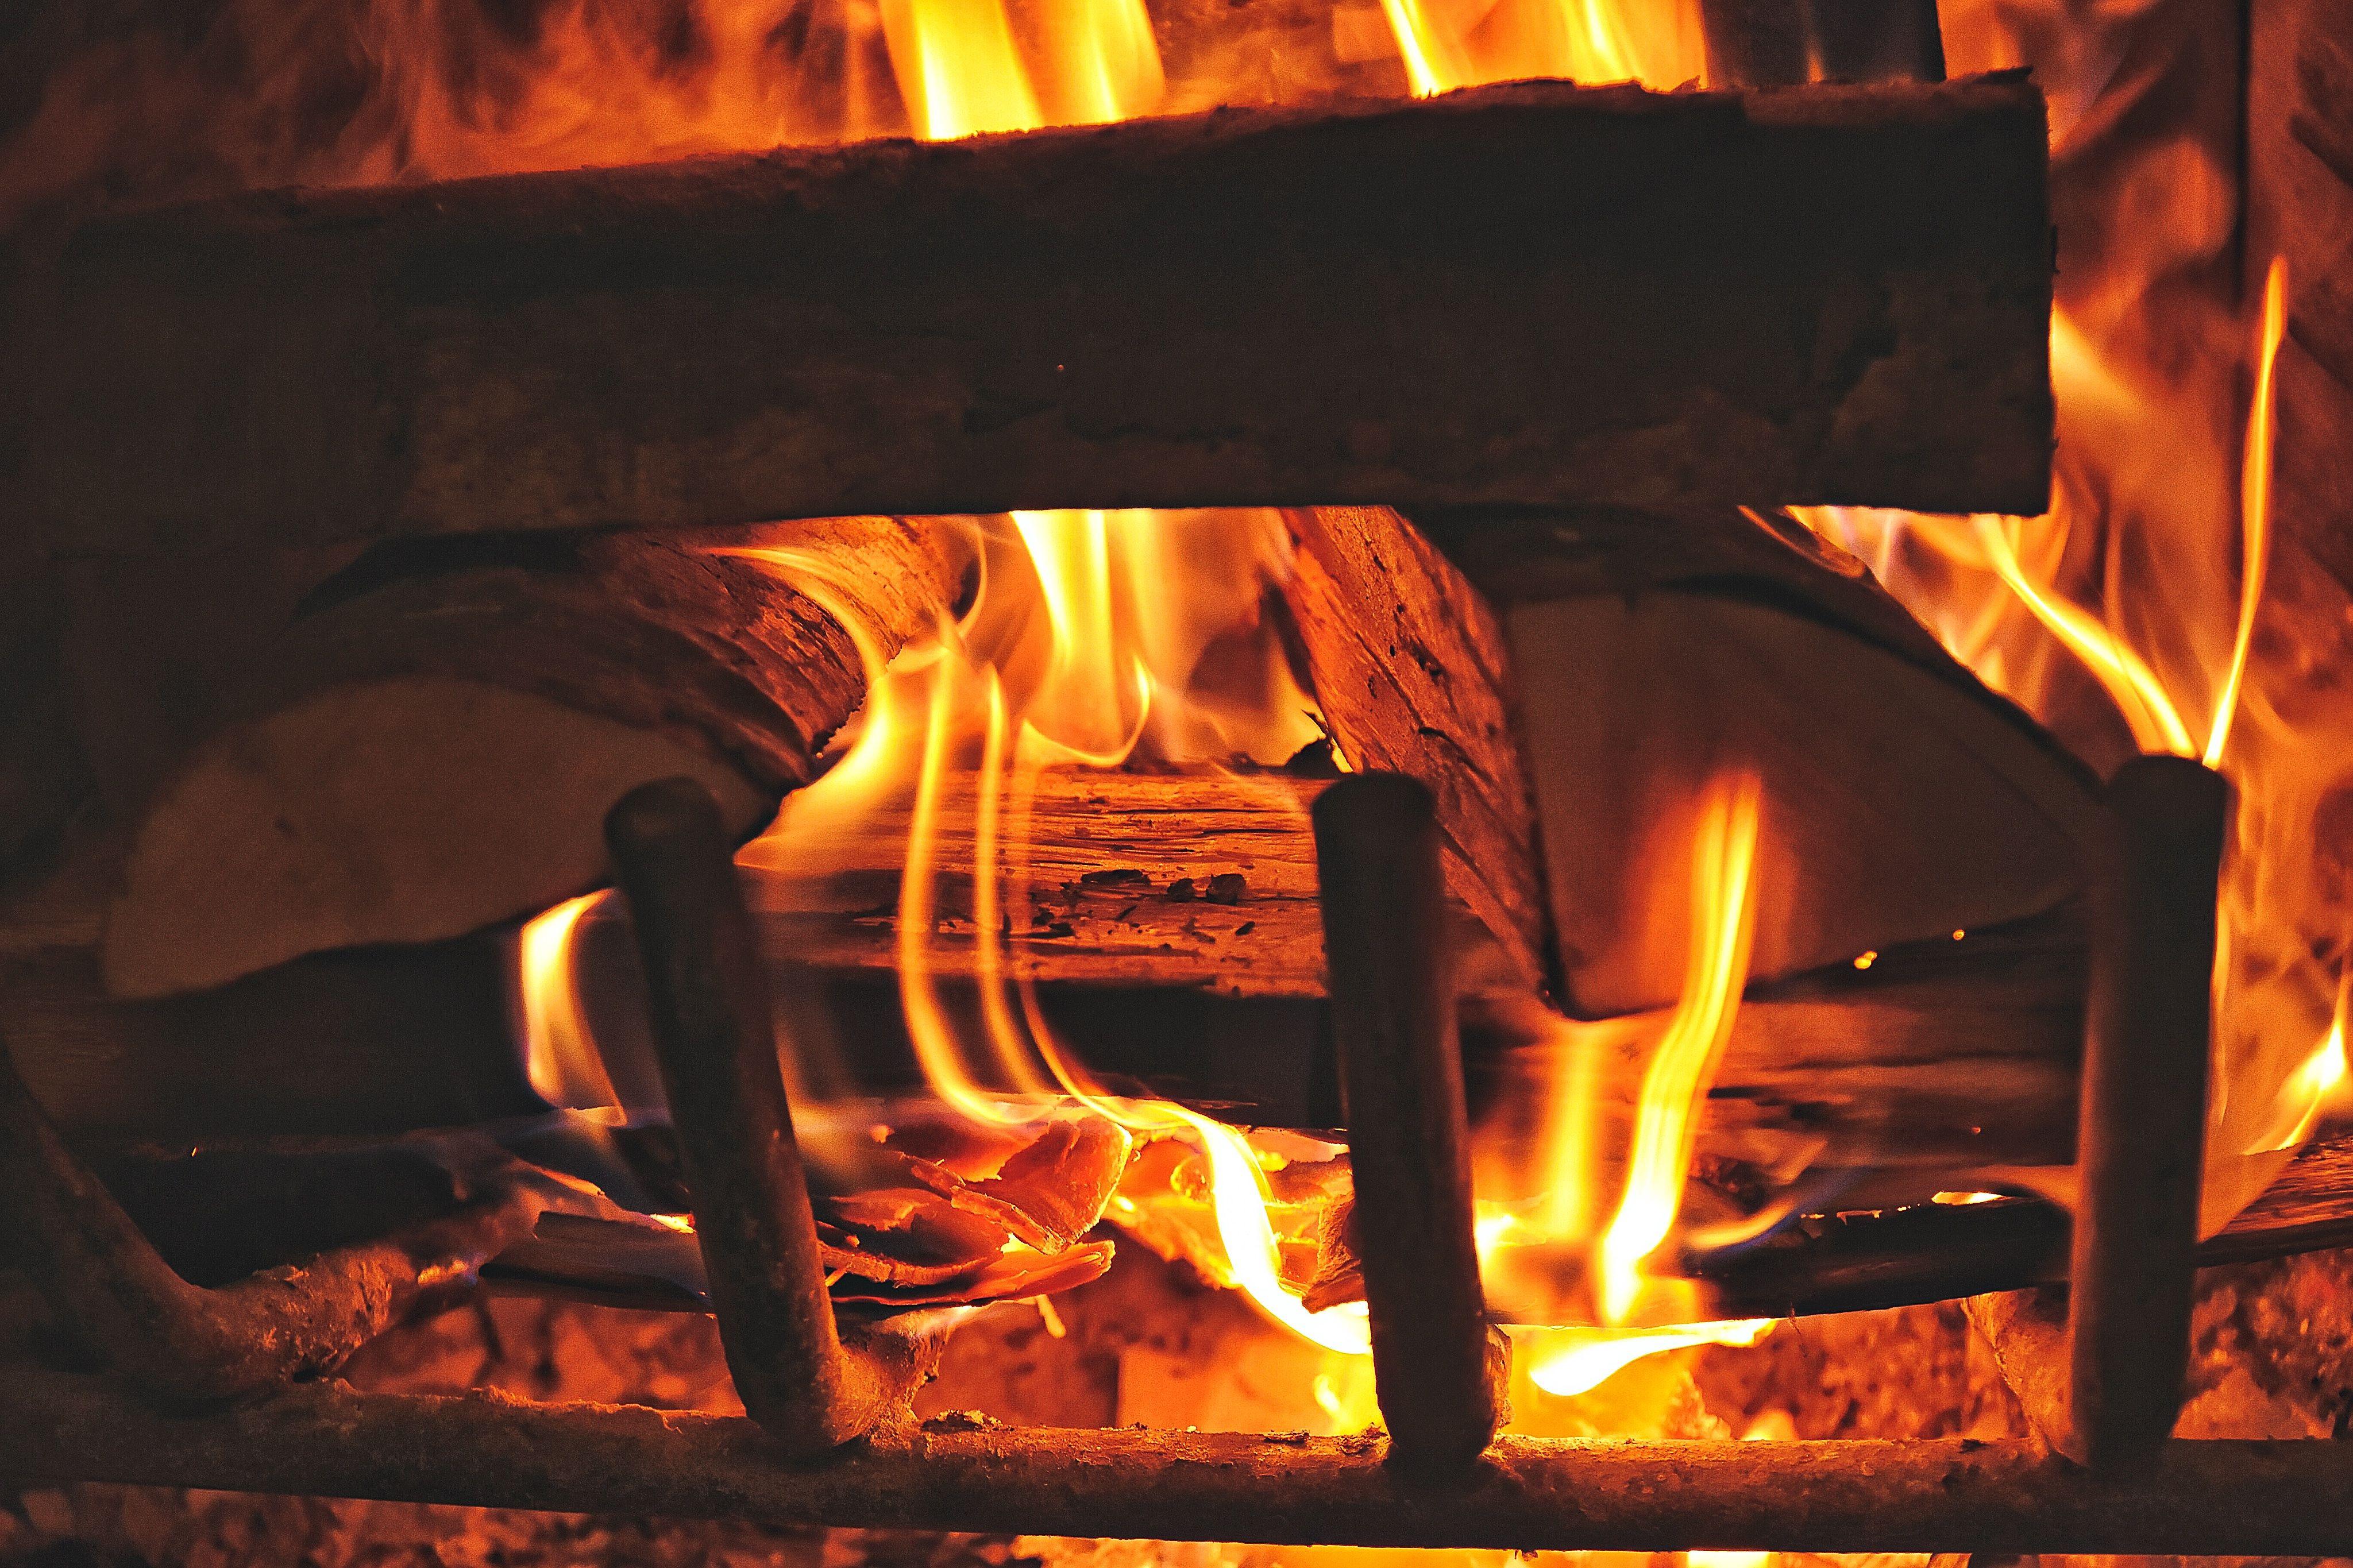 Fire Fireplace Firewood Wallpaper Fireplace Background